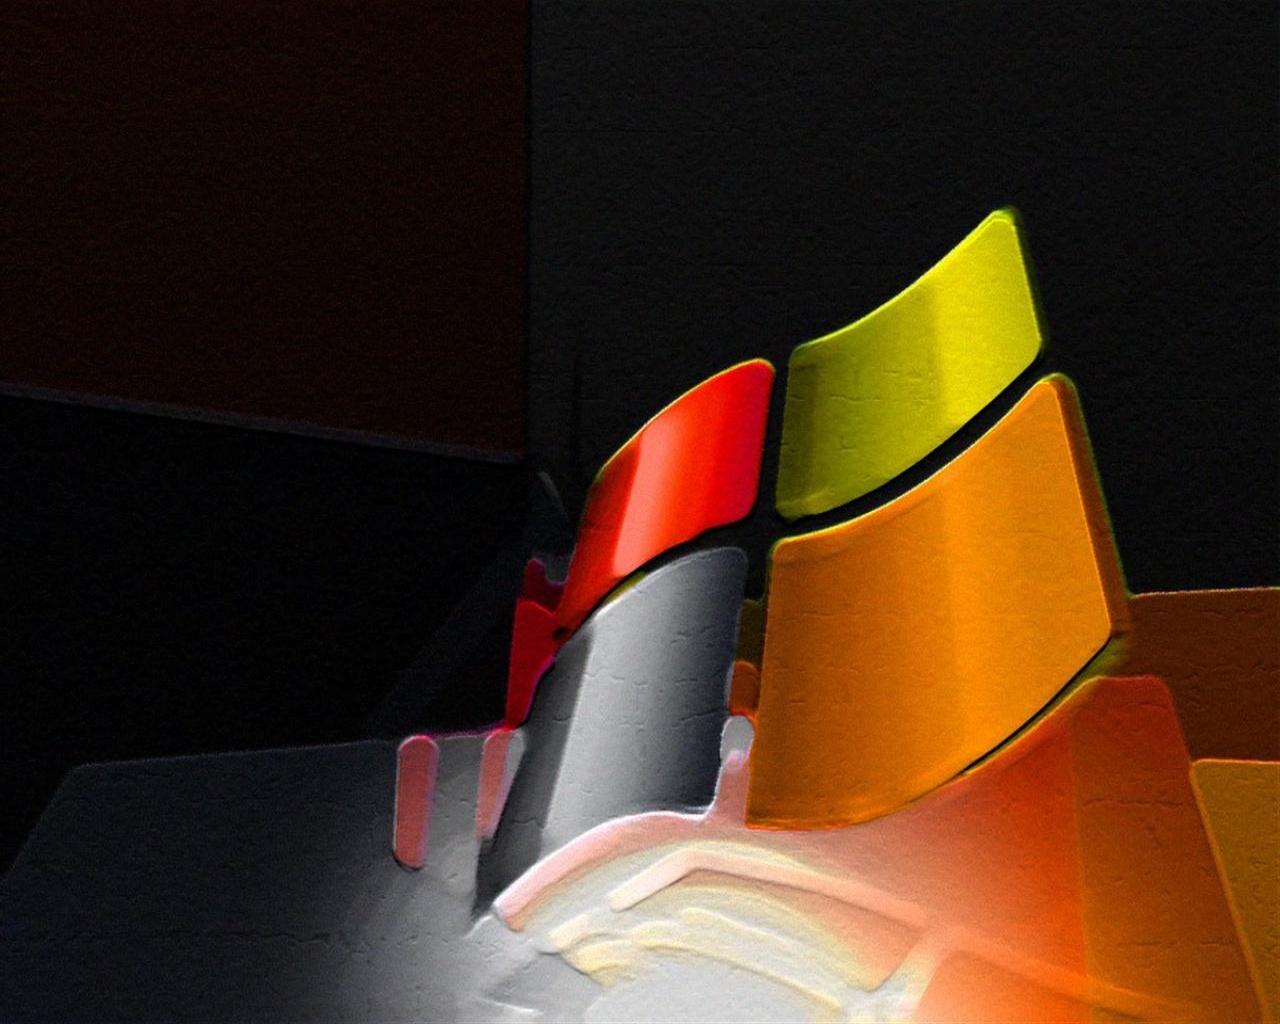 Windows XP In Saffron 1280 x 1024 Download Close 1280x1024